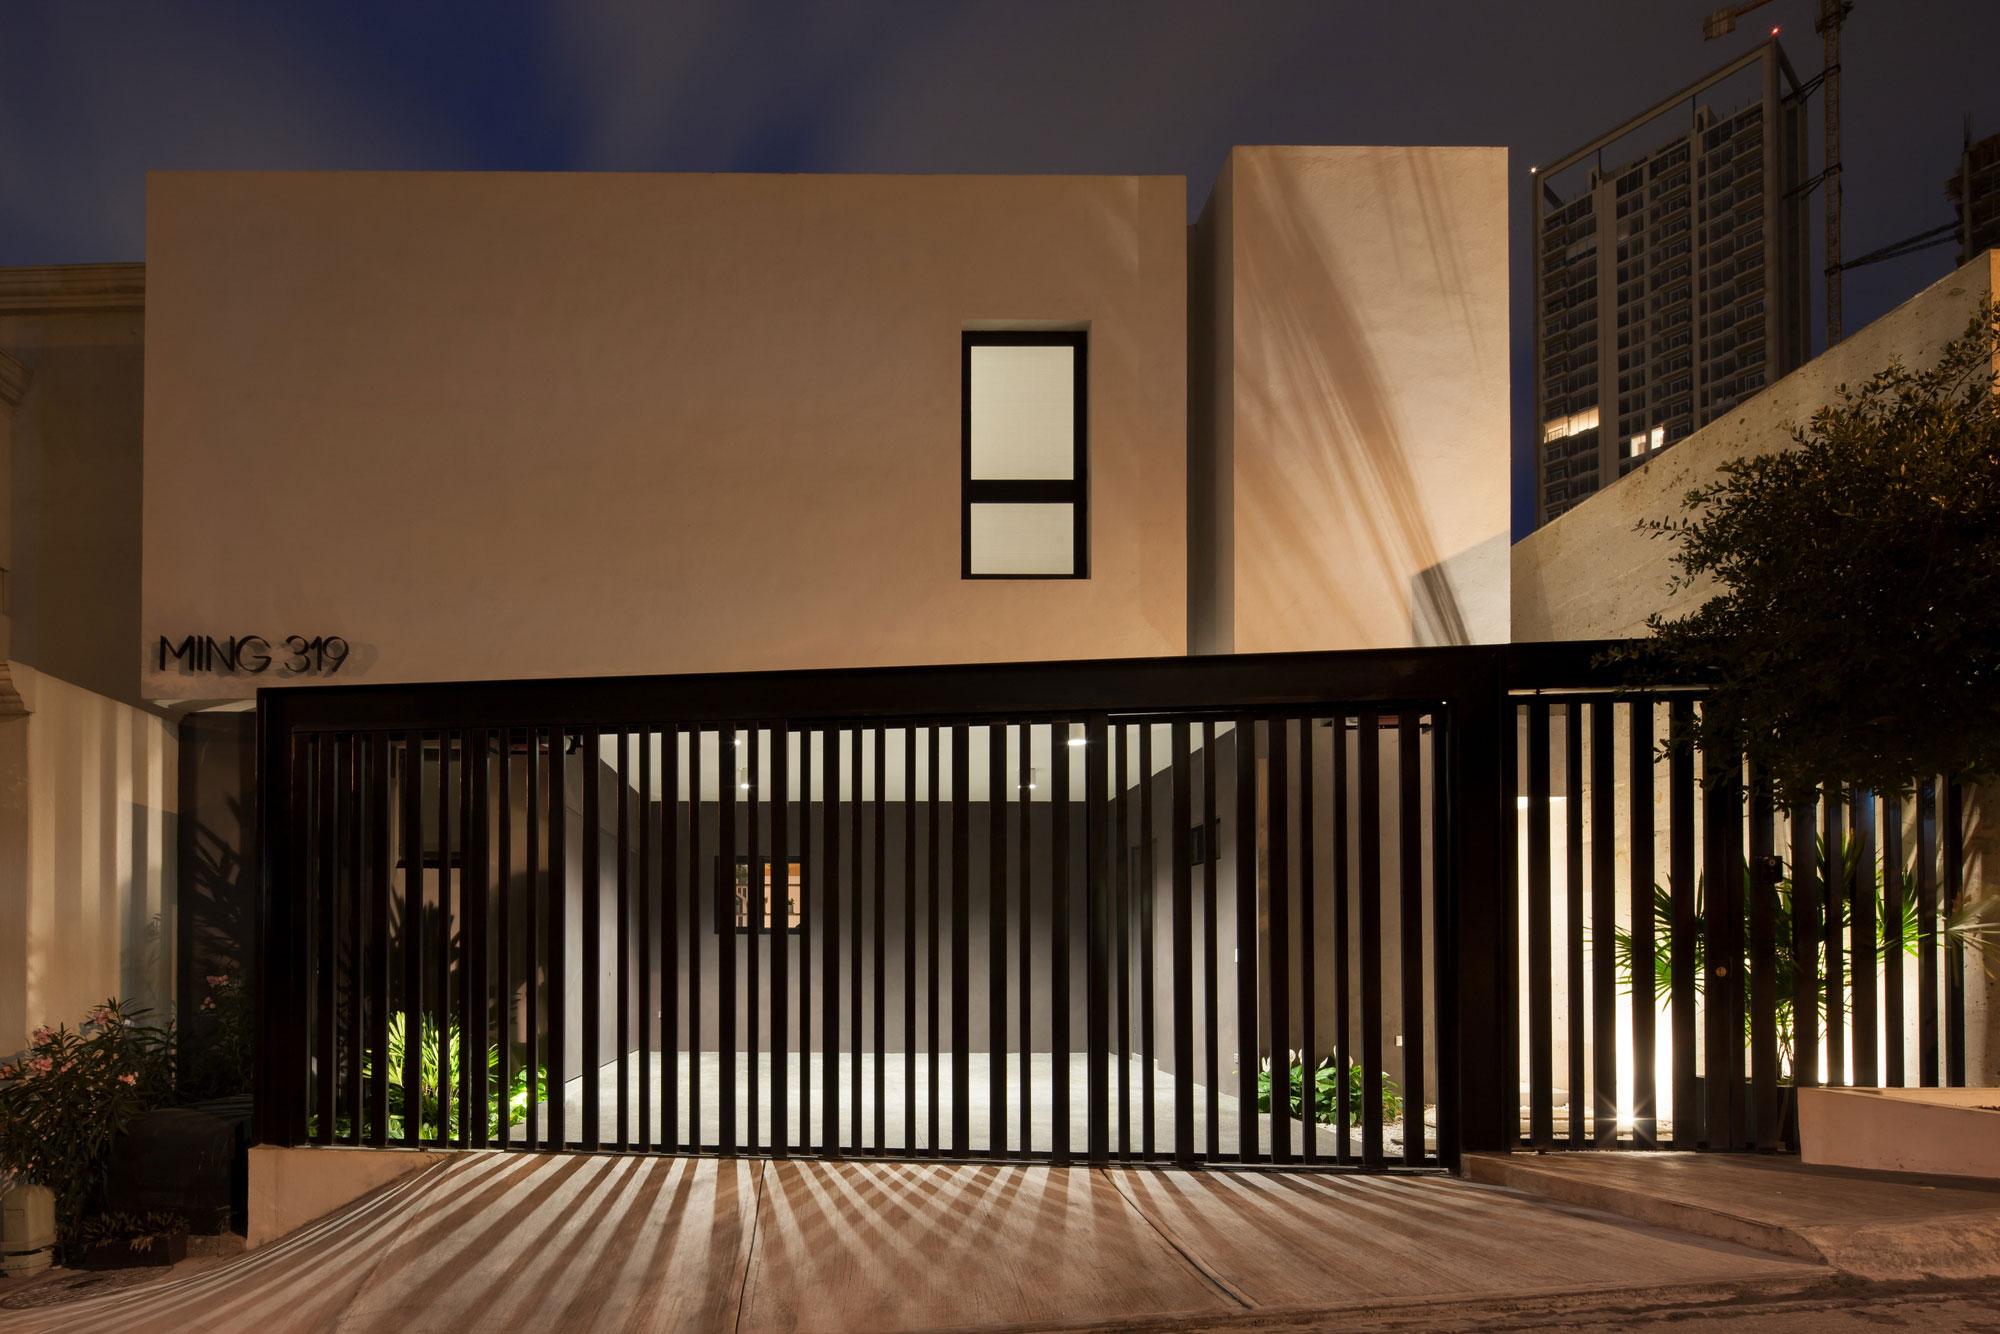 Casa Ming By Lgz Taller De Arquitectura Homedezen